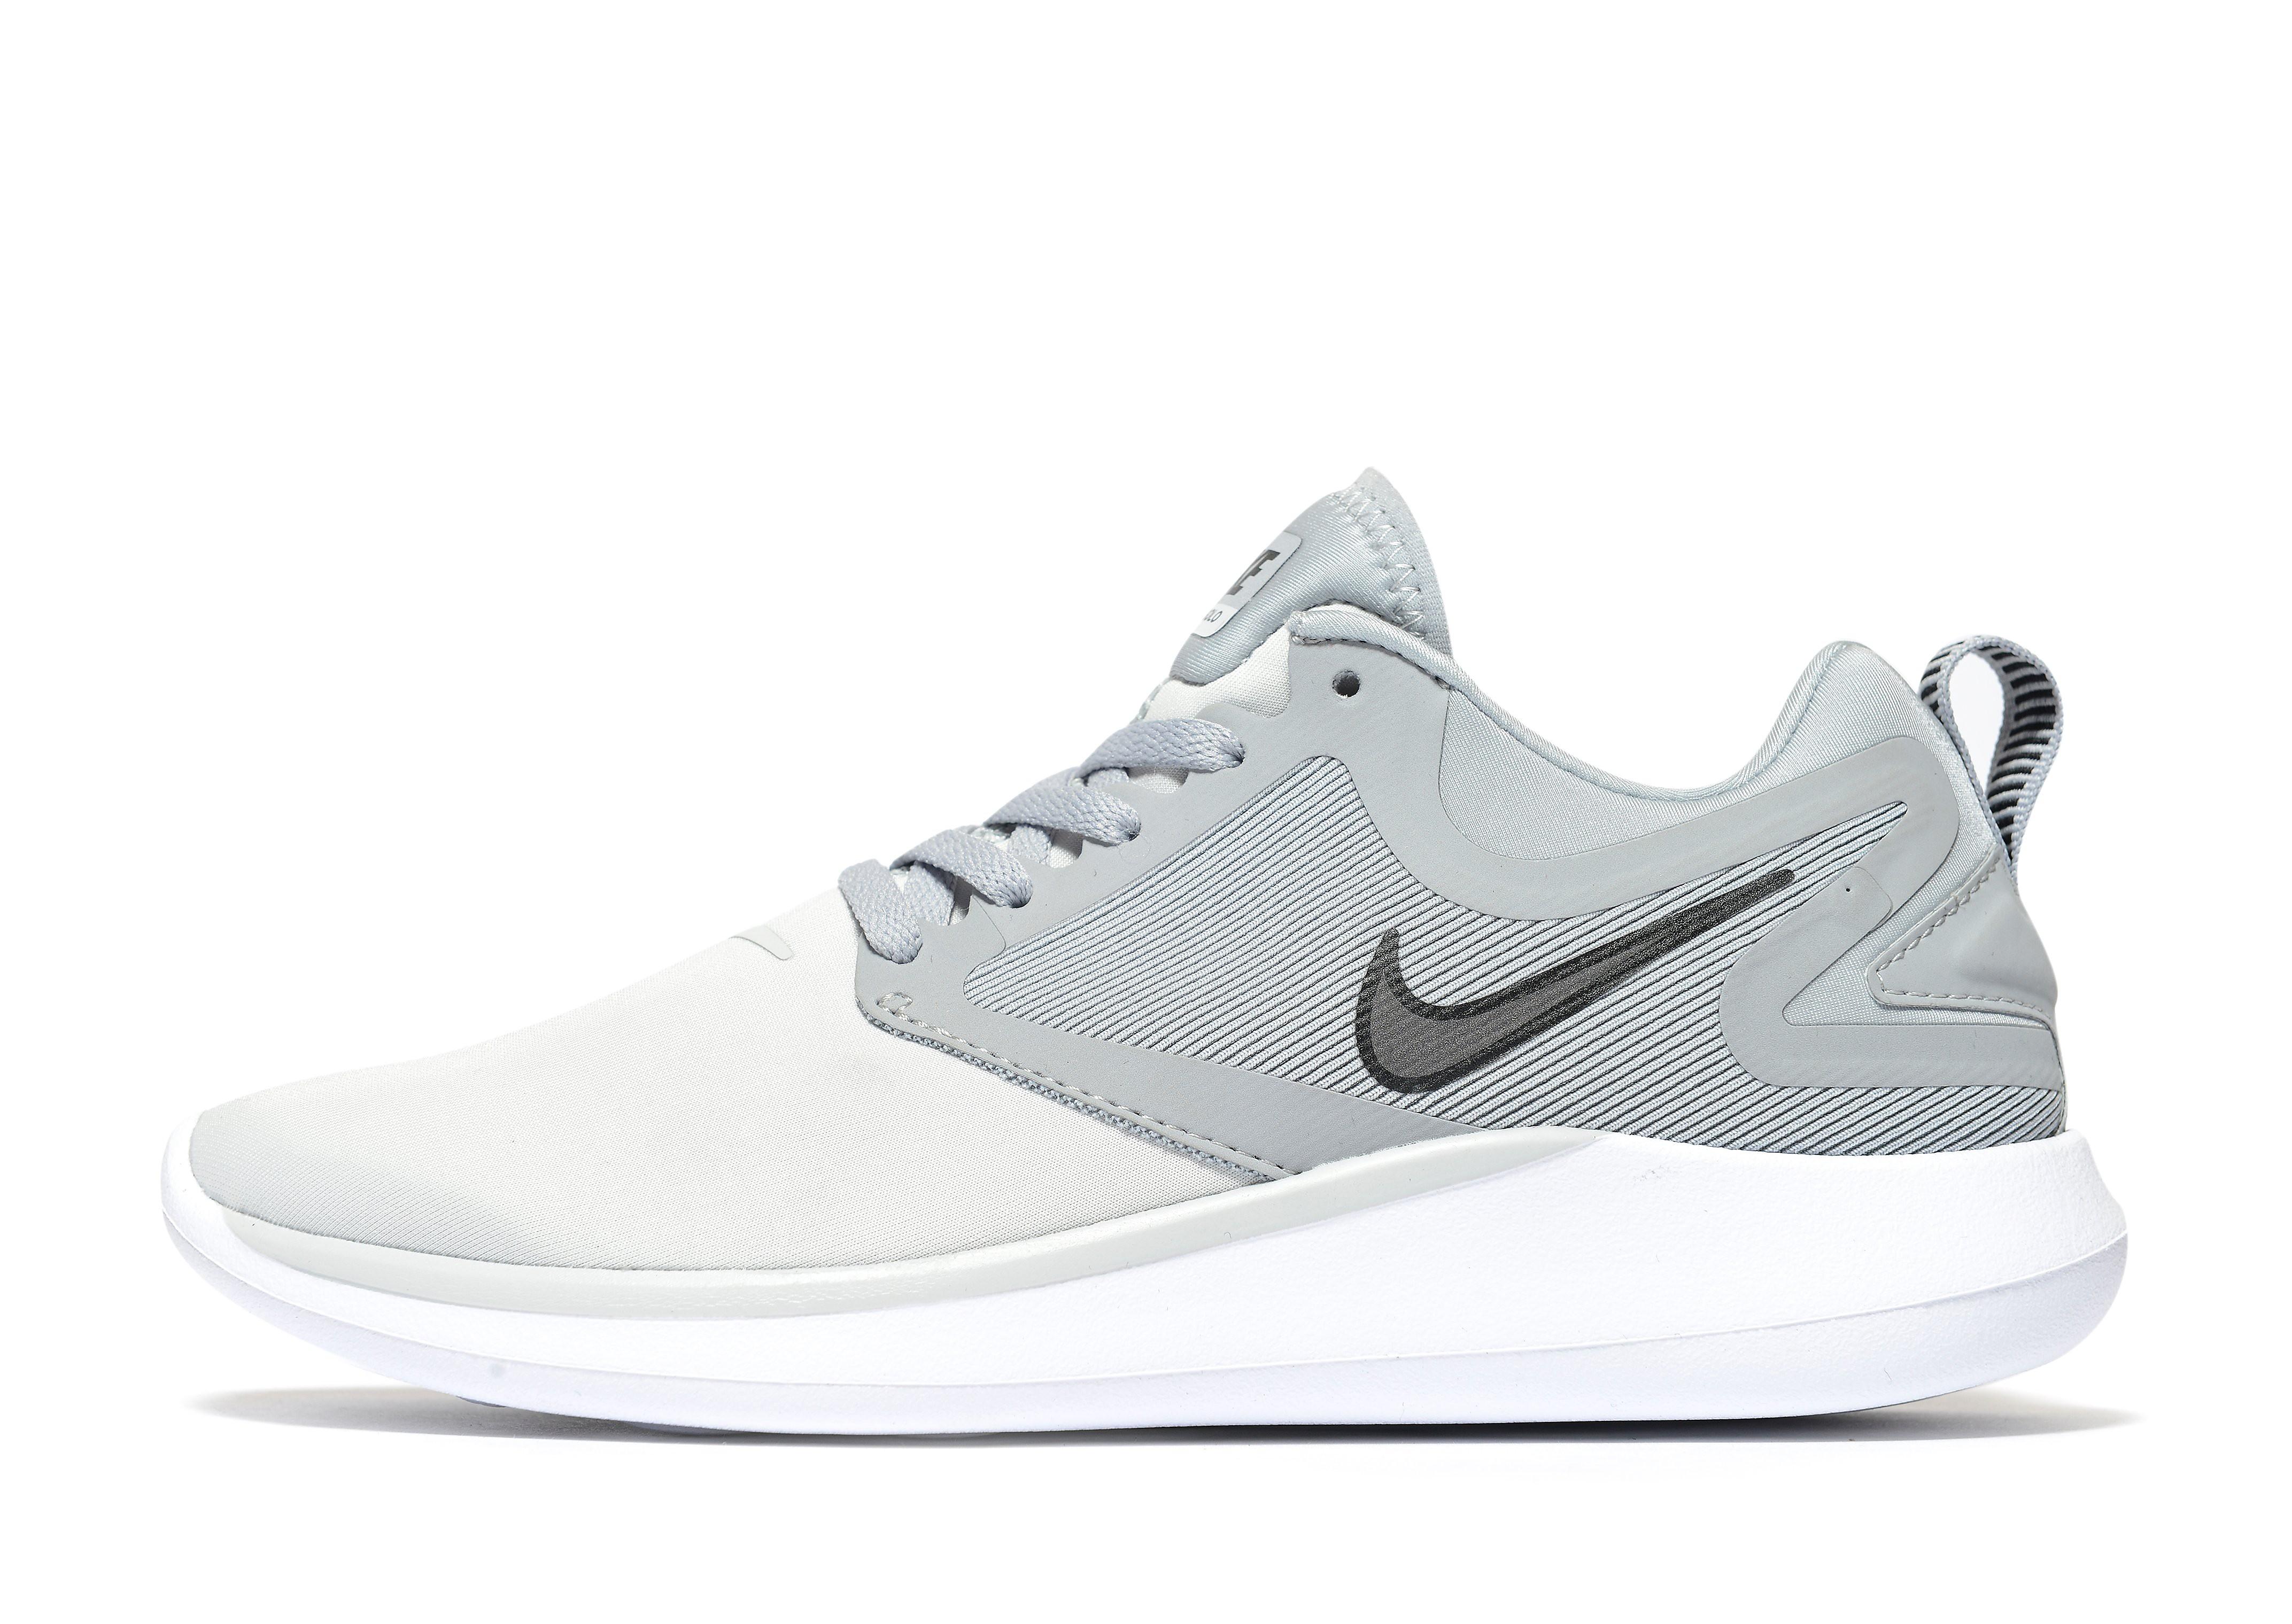 Nike LunarSolo Junior